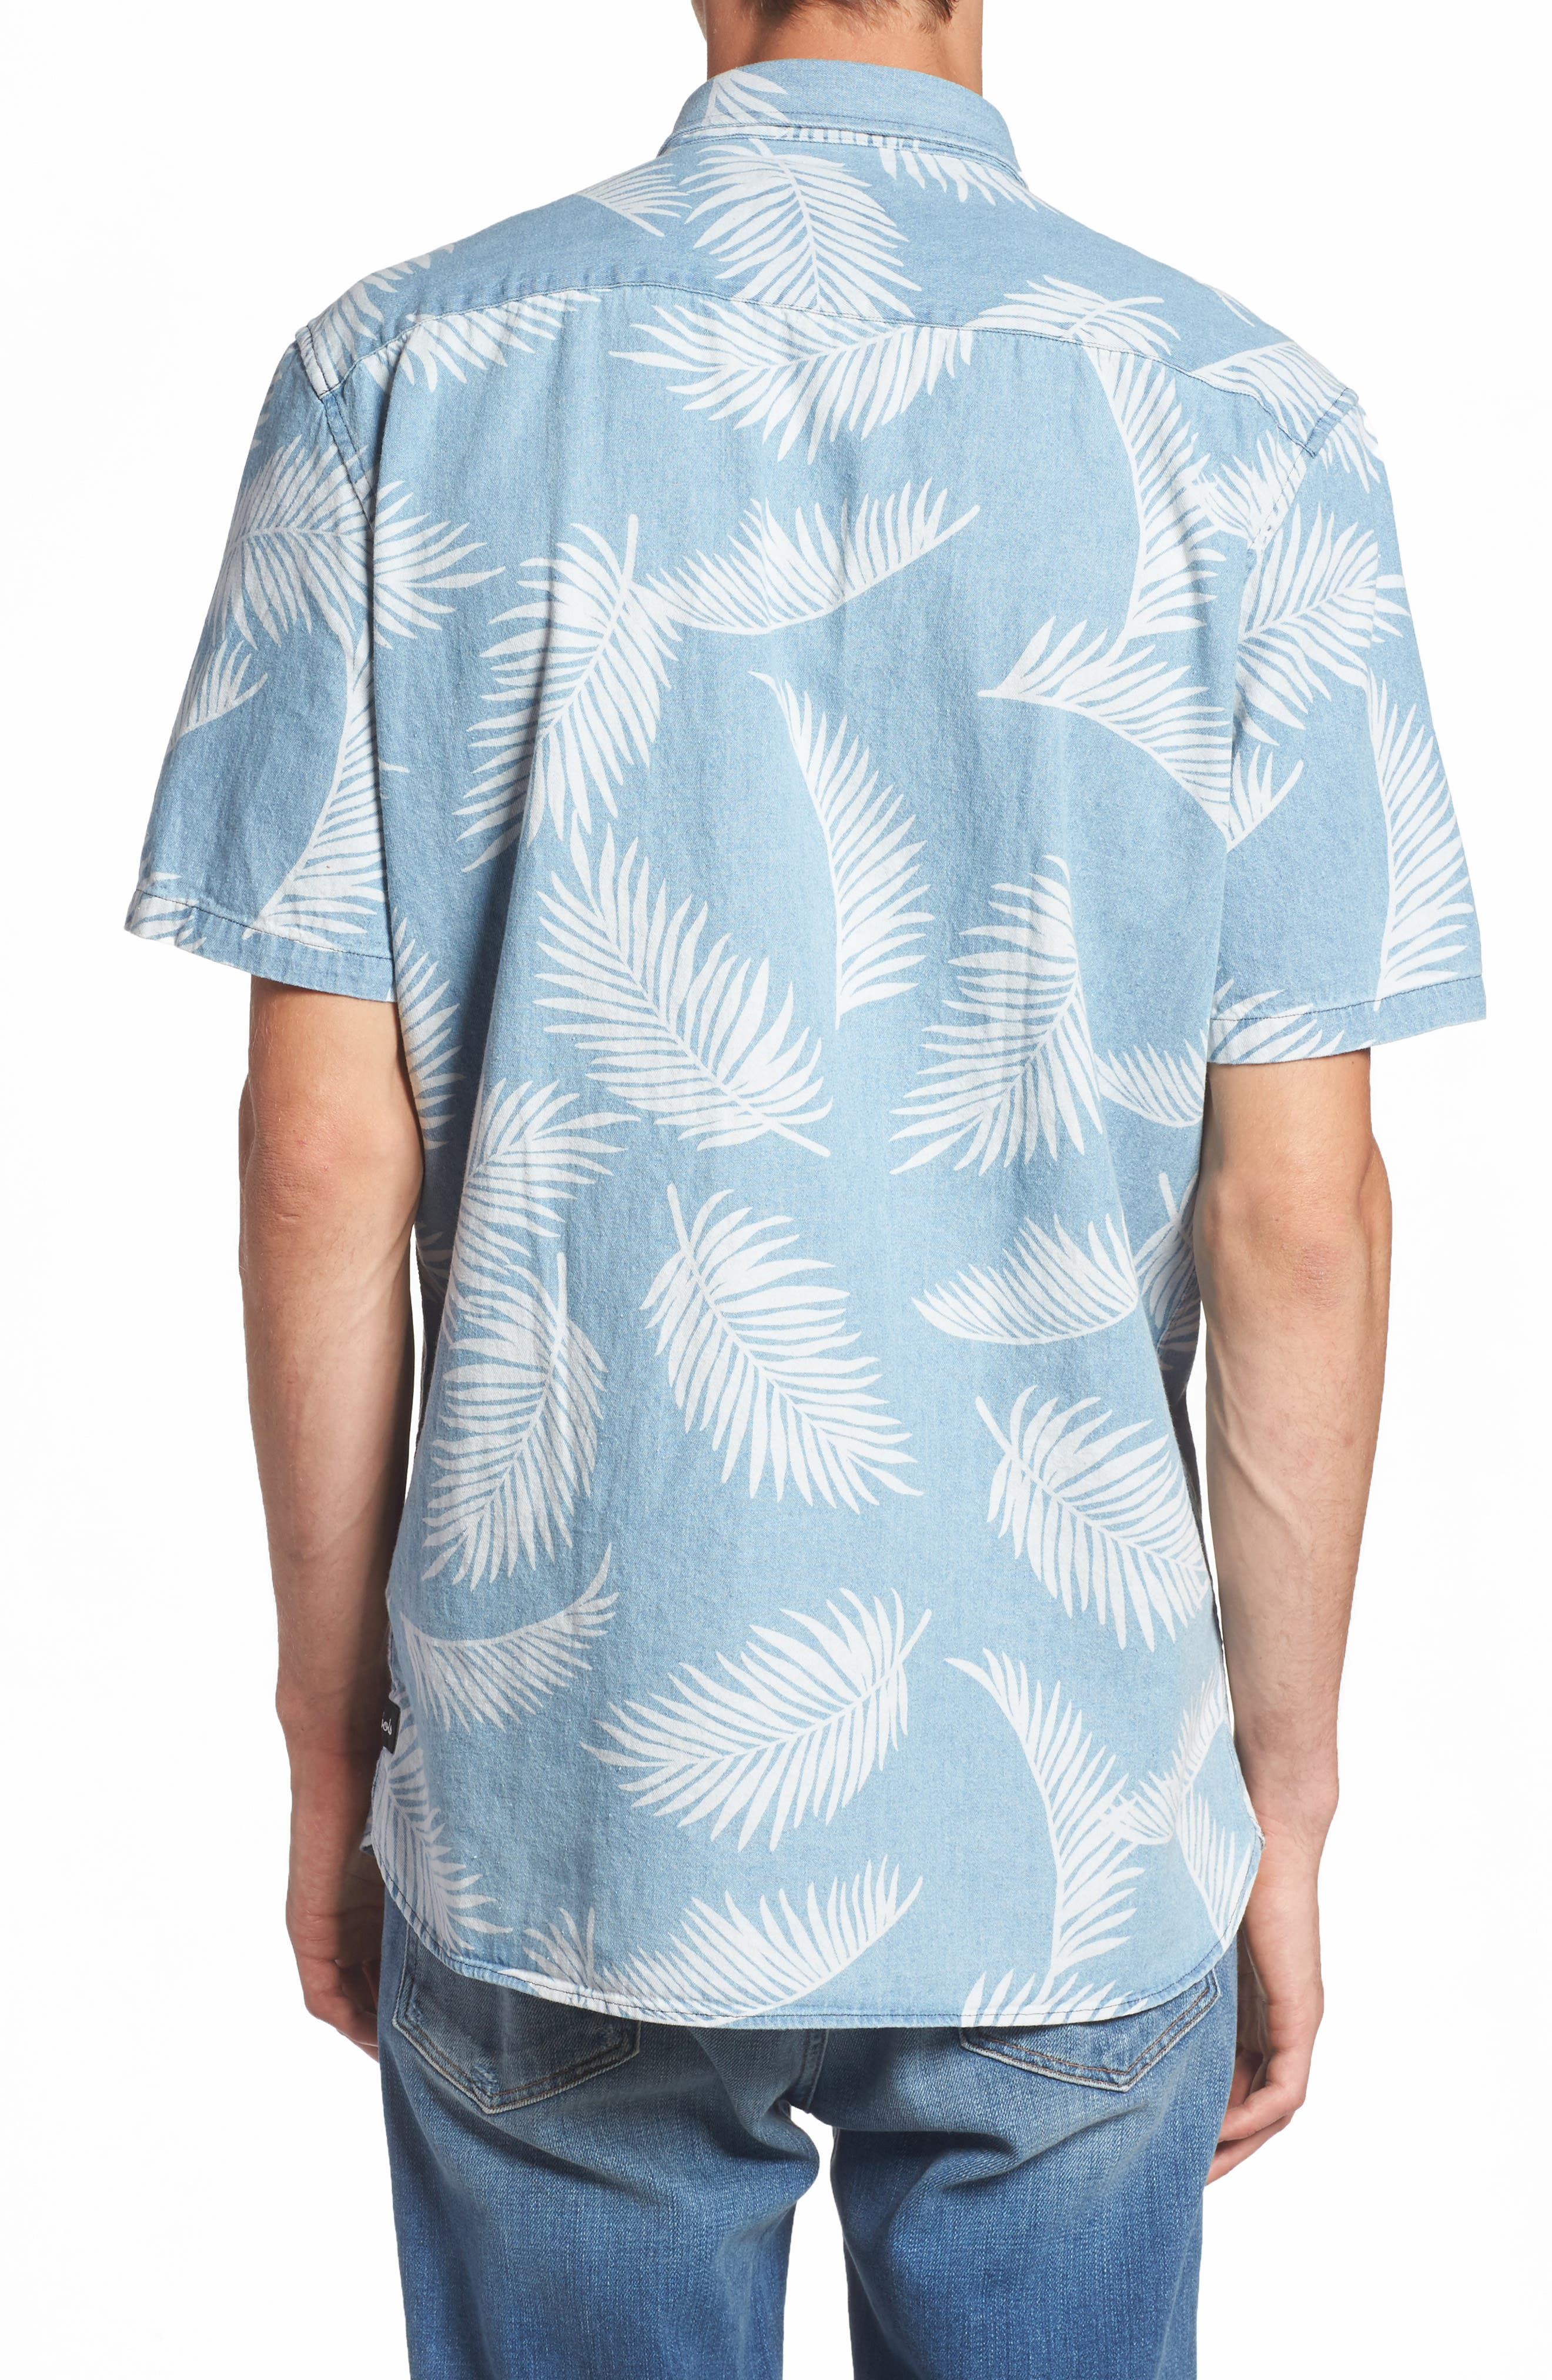 Bahamas Shirt,                             Alternate thumbnail 2, color,                             423